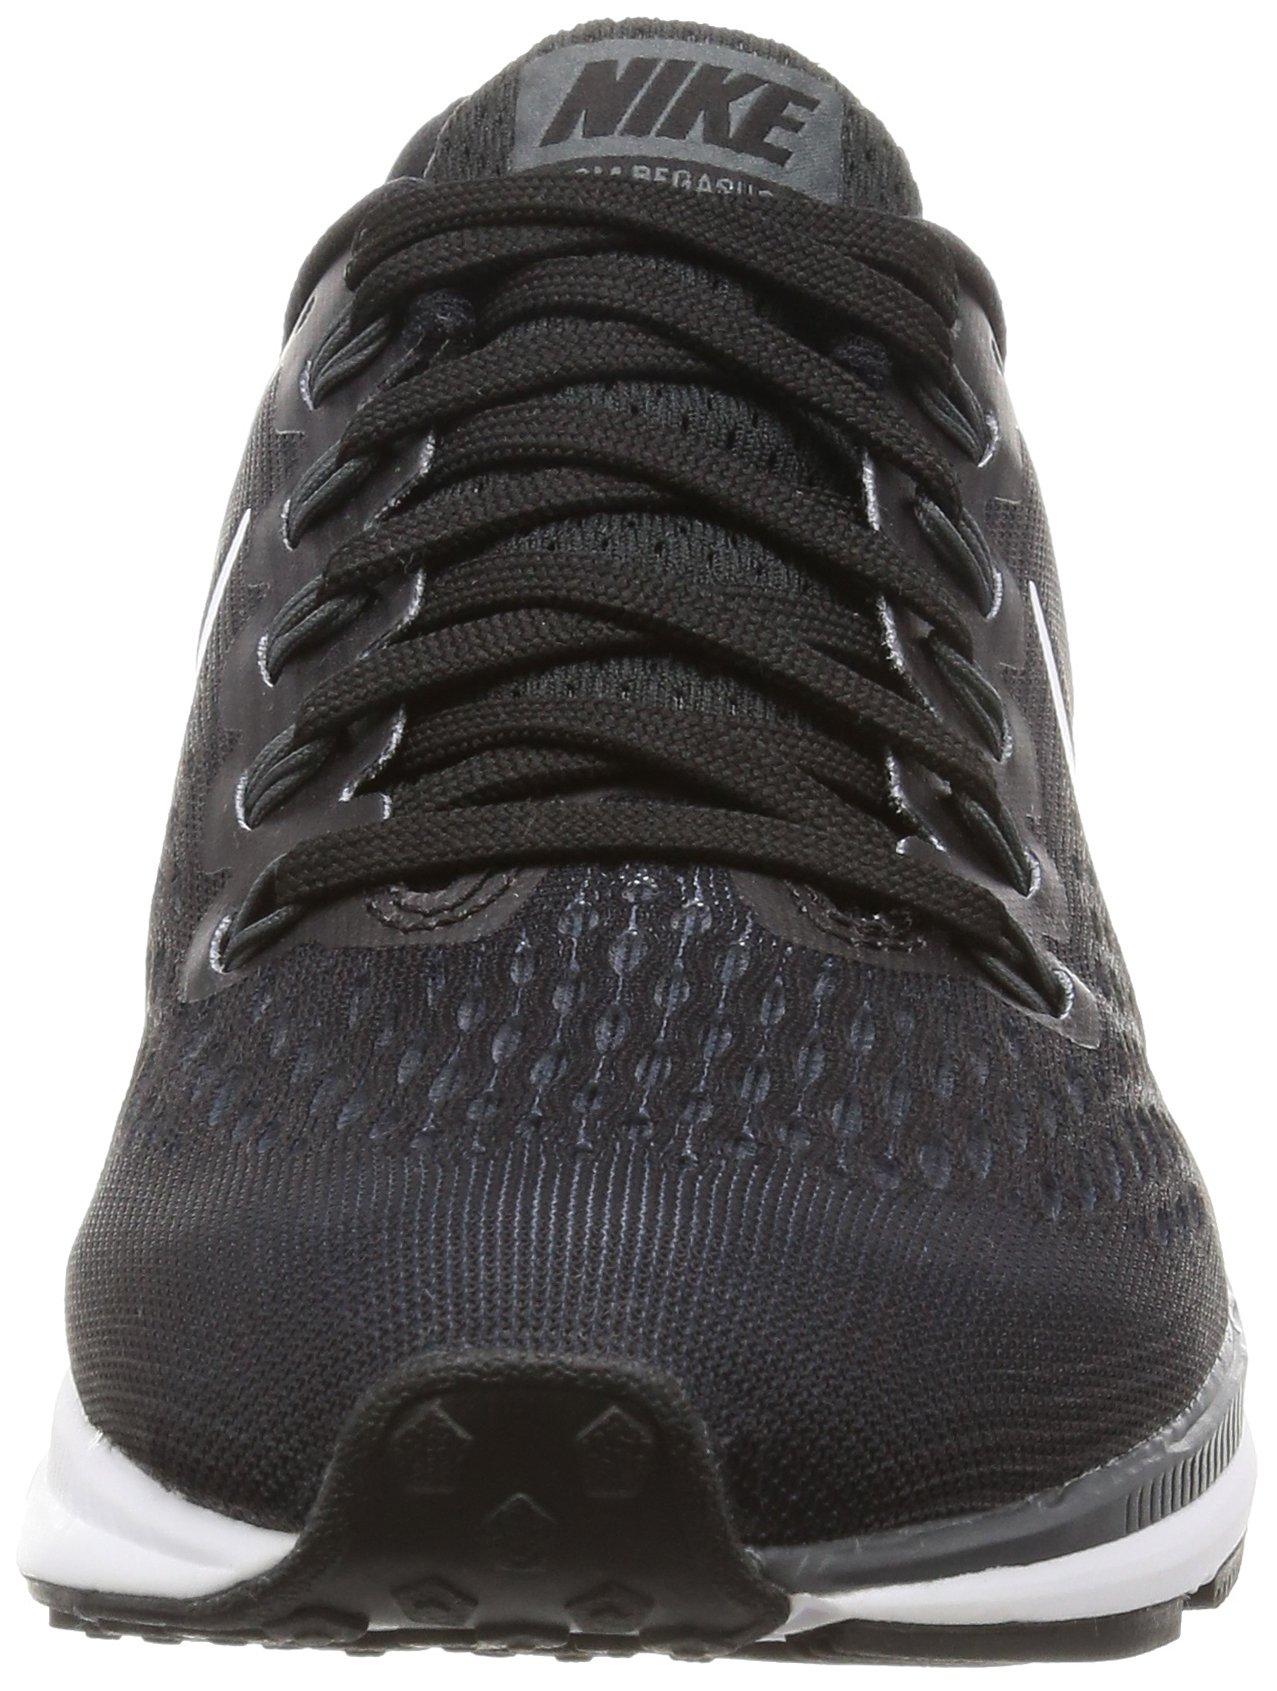 Nike Womens Air Zoom Pegasus 34 Black/White/Dark Grey/Anthracite Running Shoes (6) by Nike (Image #4)